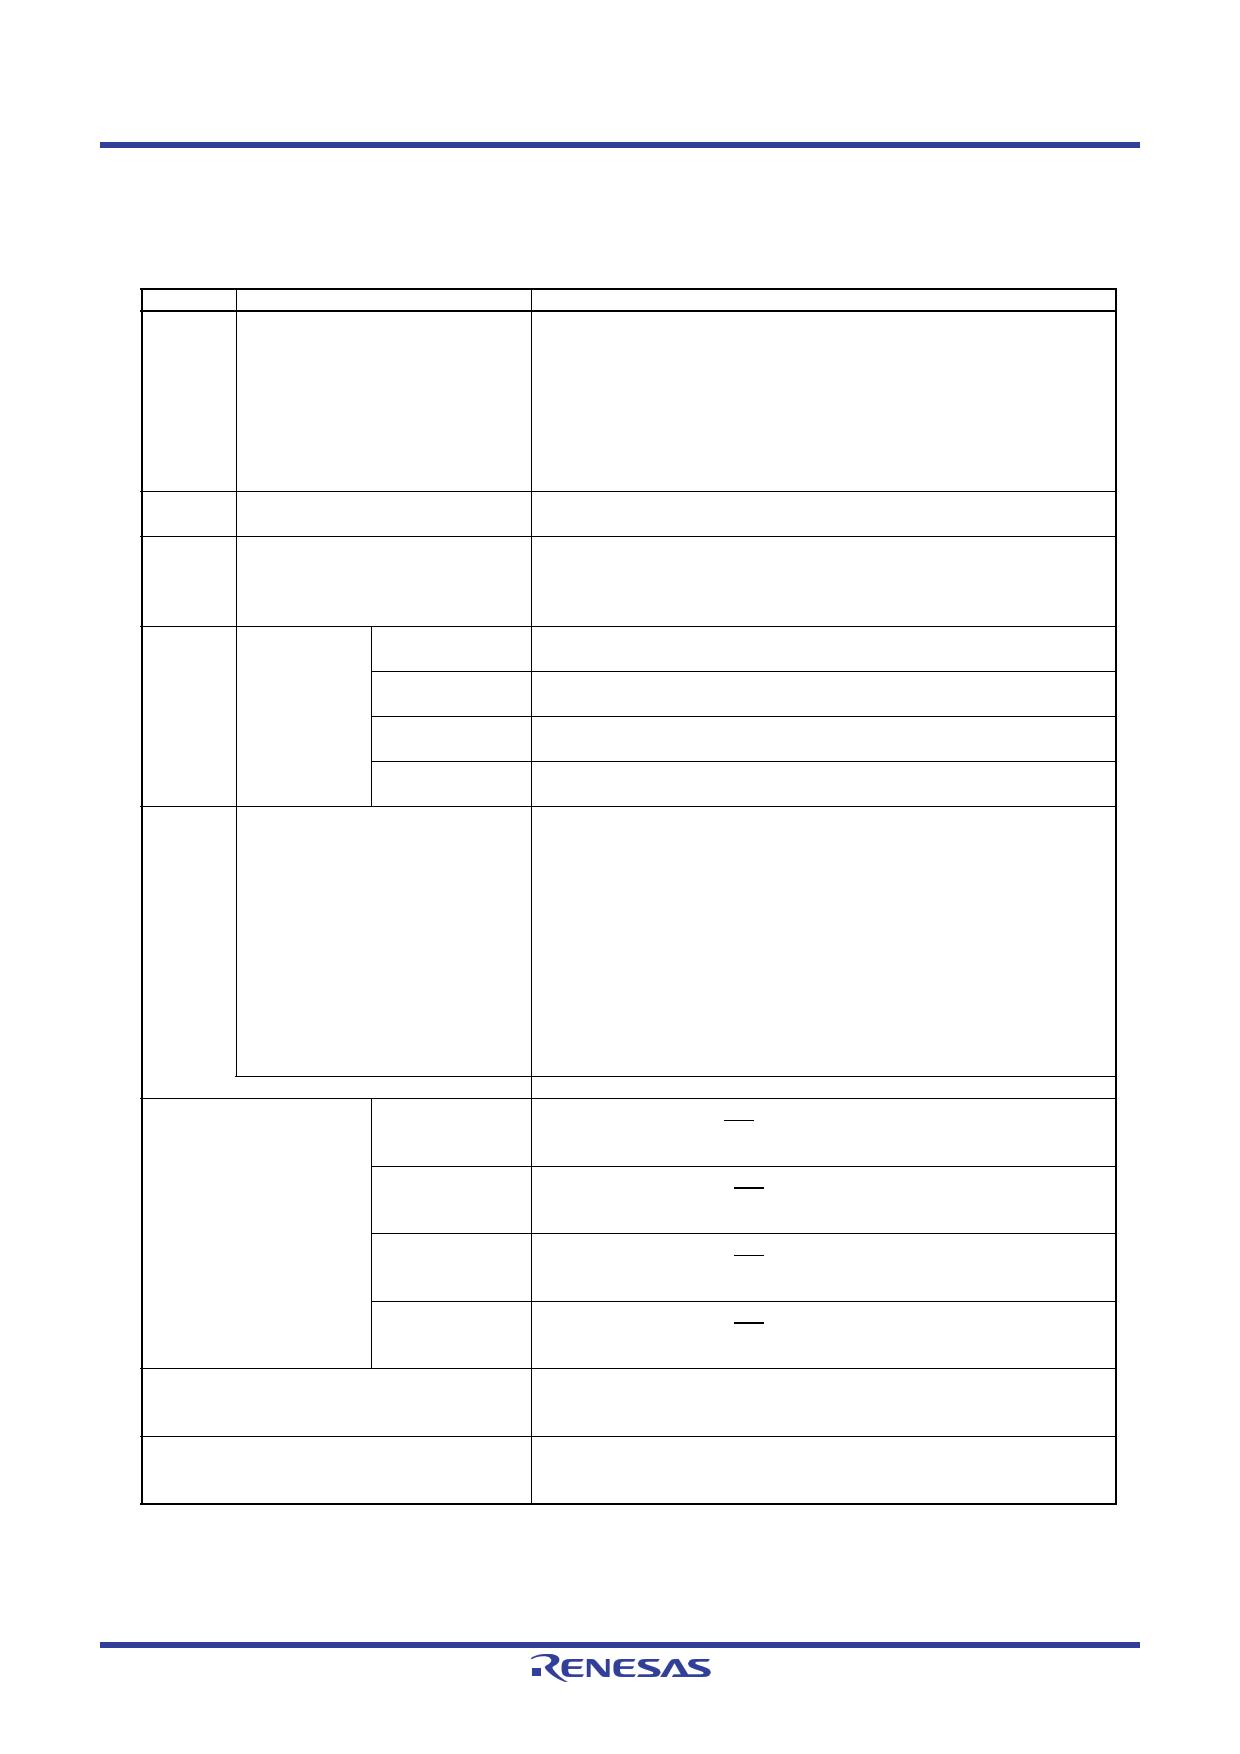 R5F2L357CDFP pdf, 반도체, 판매, 대치품